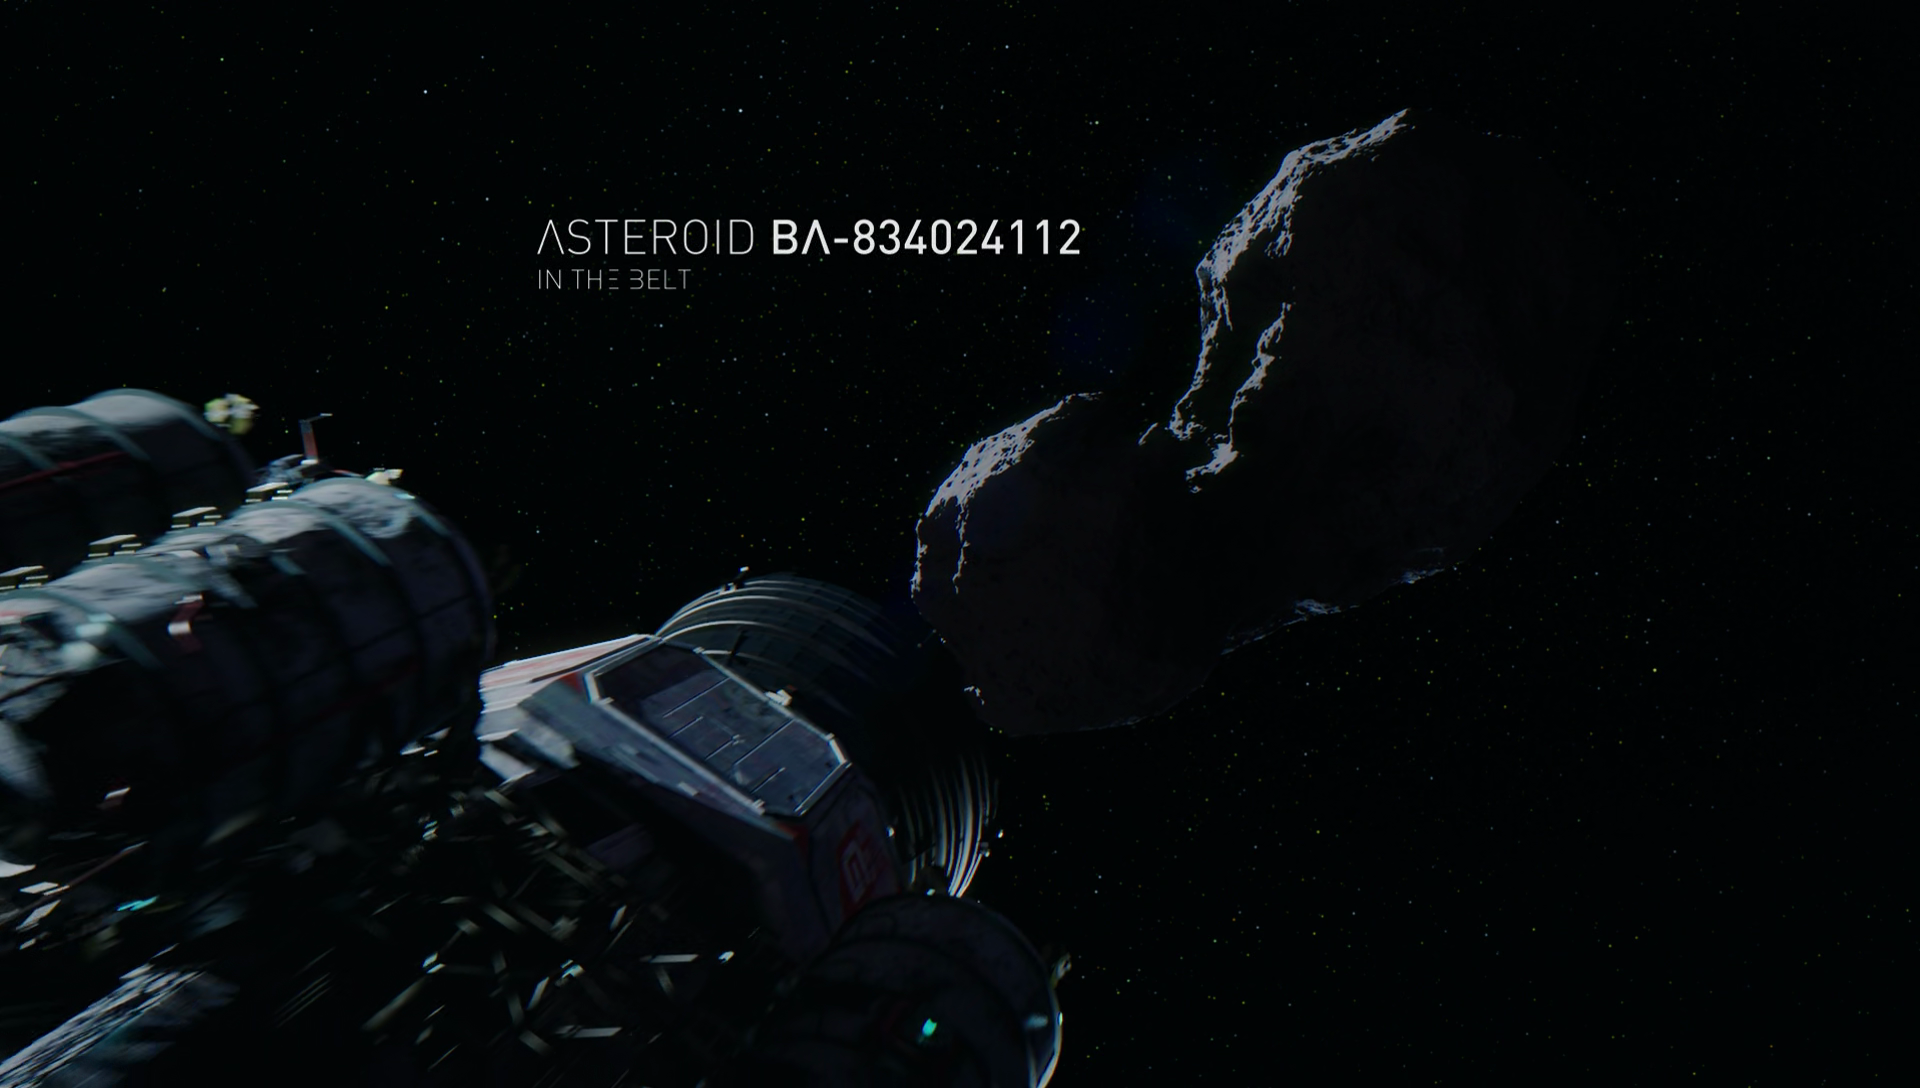 BA-834024112